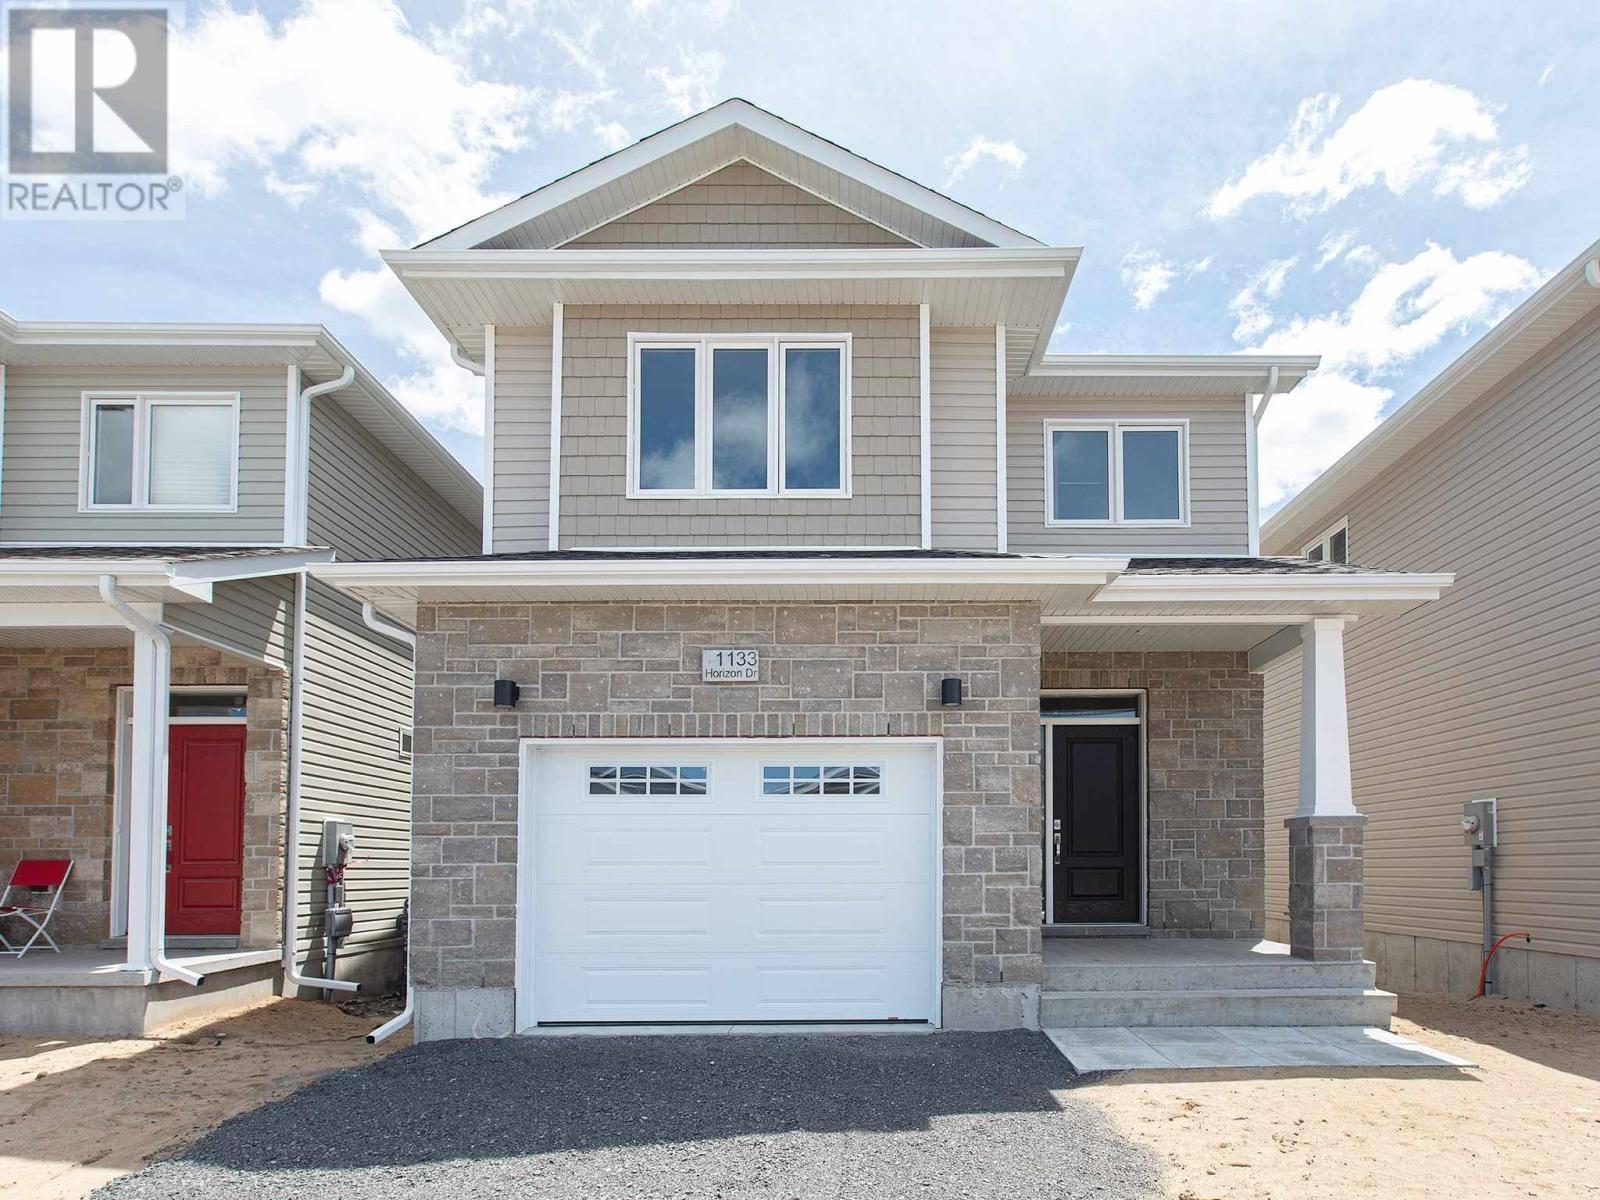 House for sale at 1133 Horizon Dr Kingston Ontario - MLS: K19004375